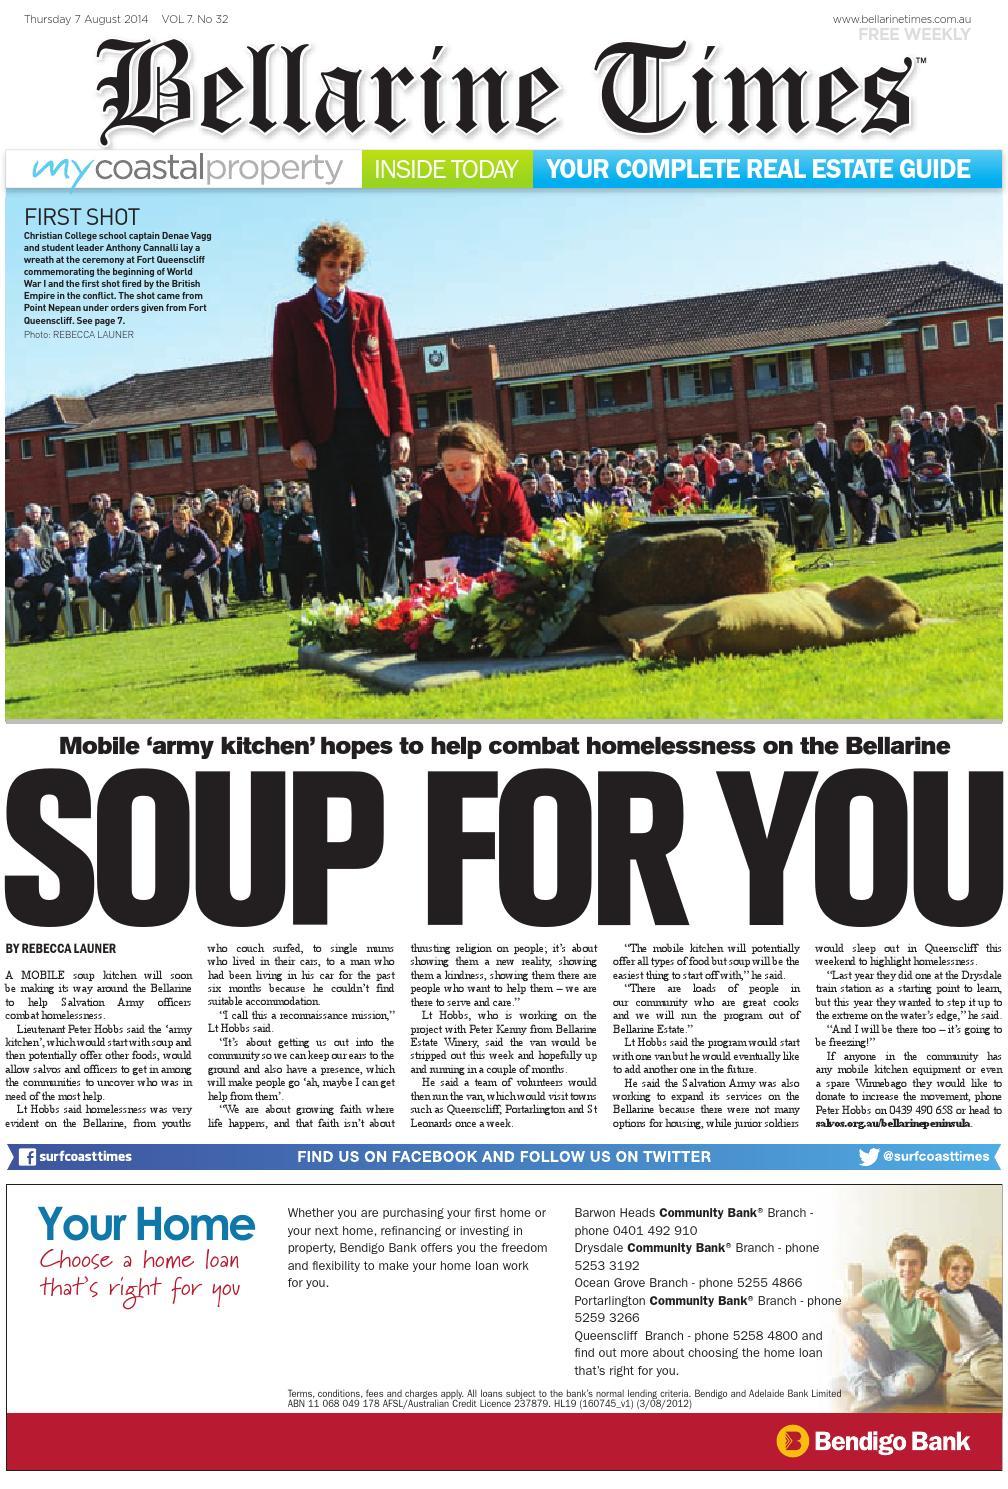 09dc3cebc73 Bellarine Times: August 7, 2014 by Surf Coast News Australia Pty Ltd - issuu